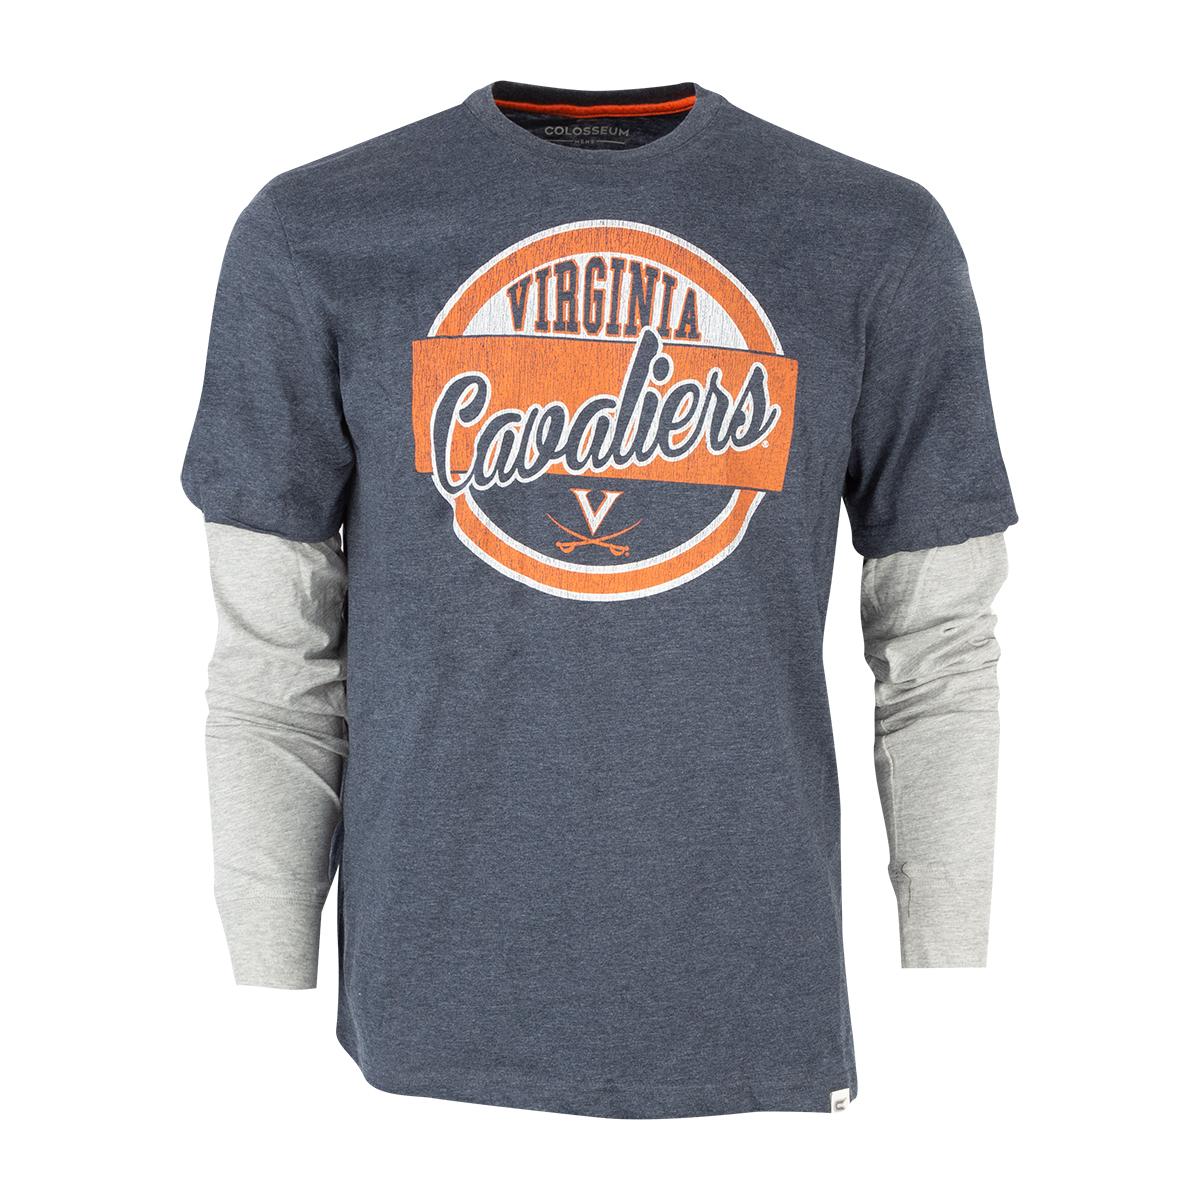 University of Virginia 2-Layer Long Sleeve T-shirt